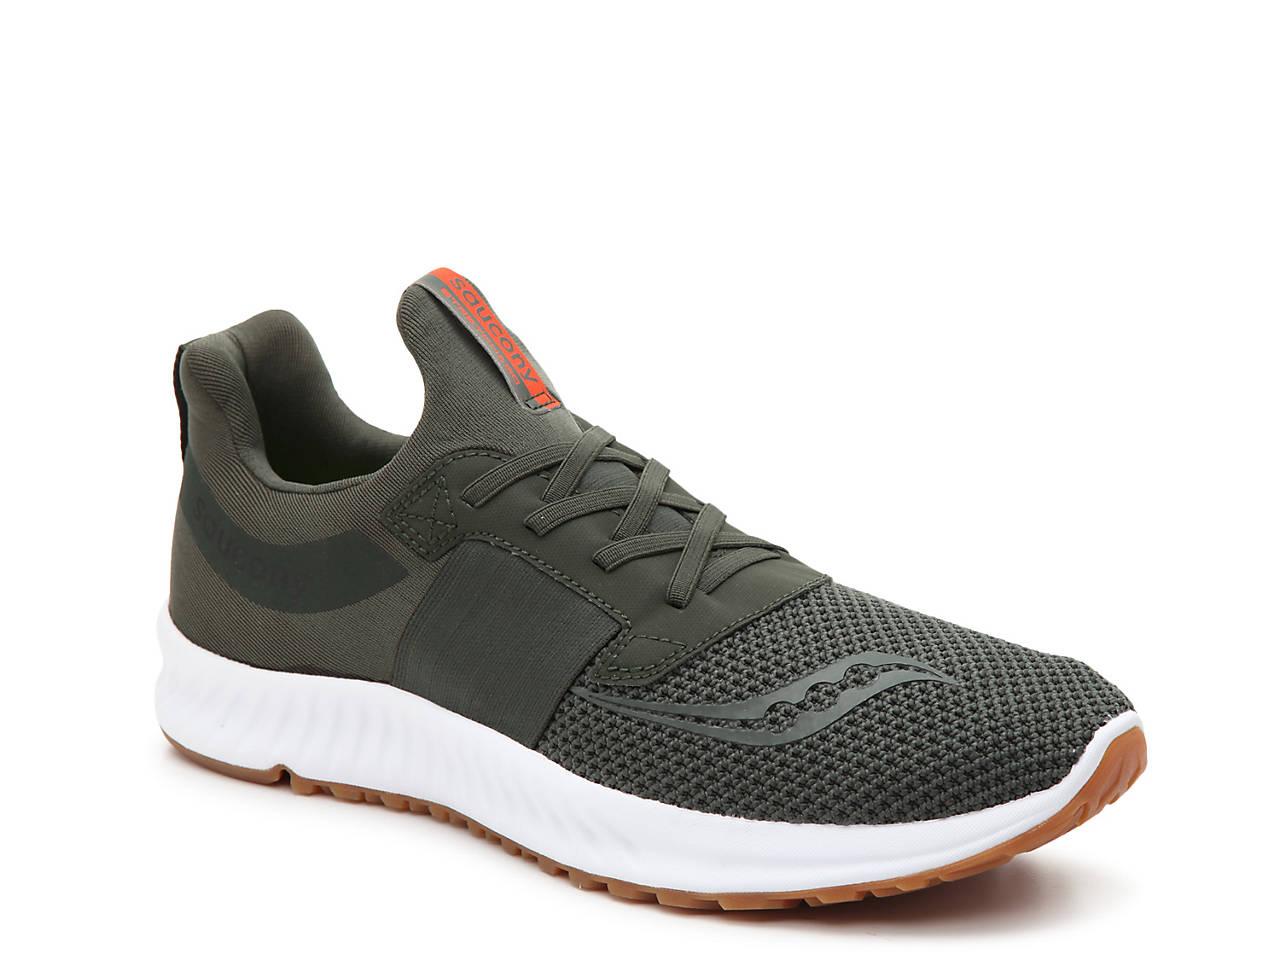 05e1ec46adec9 Stretch & Go Breeze Lightweight Slip-On Running Shoe - Men's